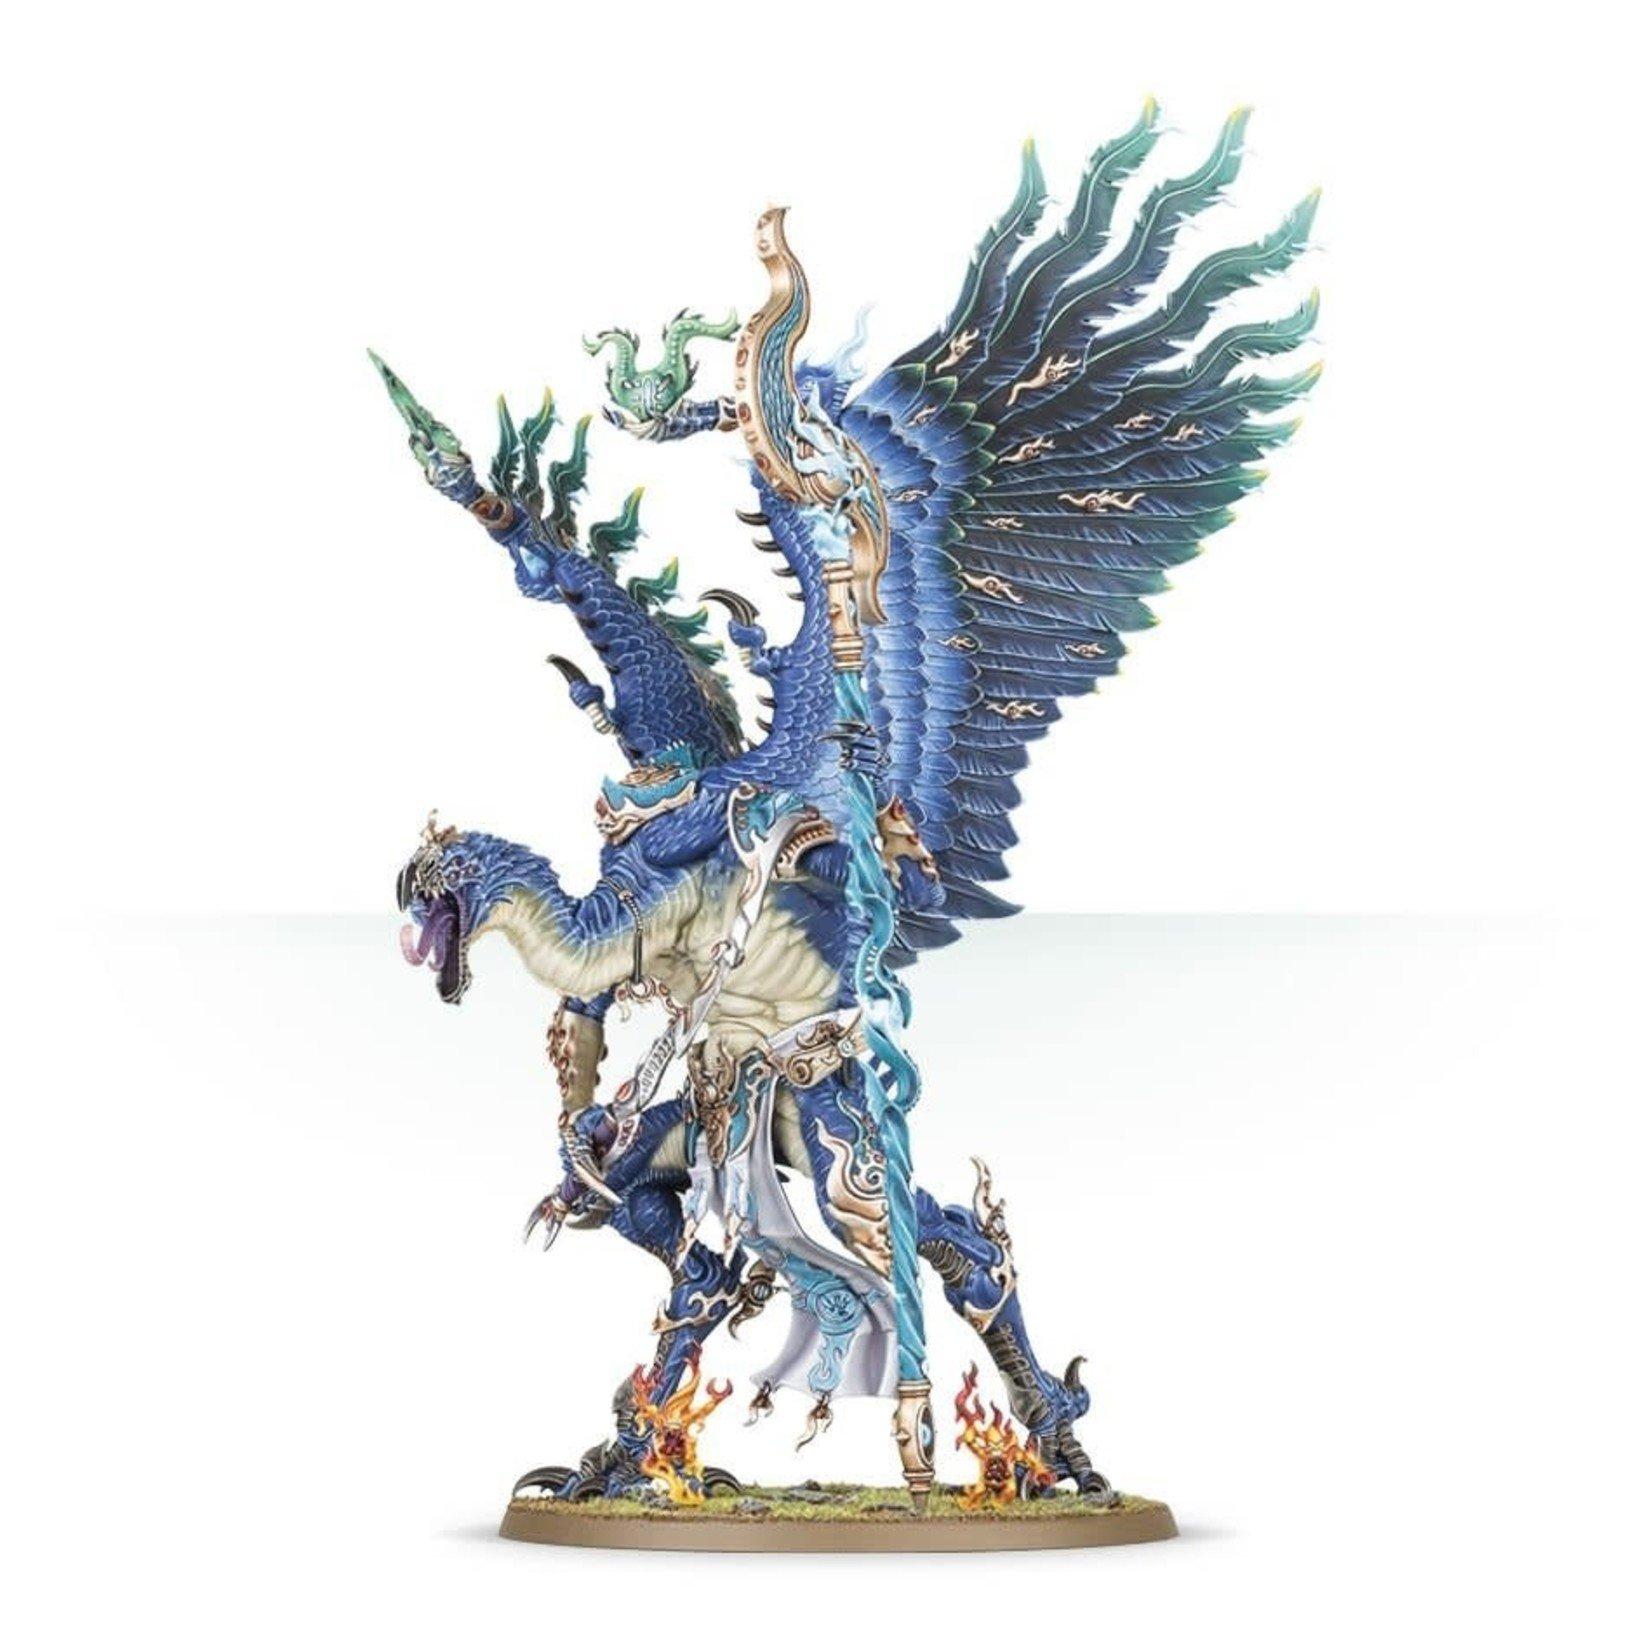 Games Workshop Daemons Of Tzeentch Lord Of Change